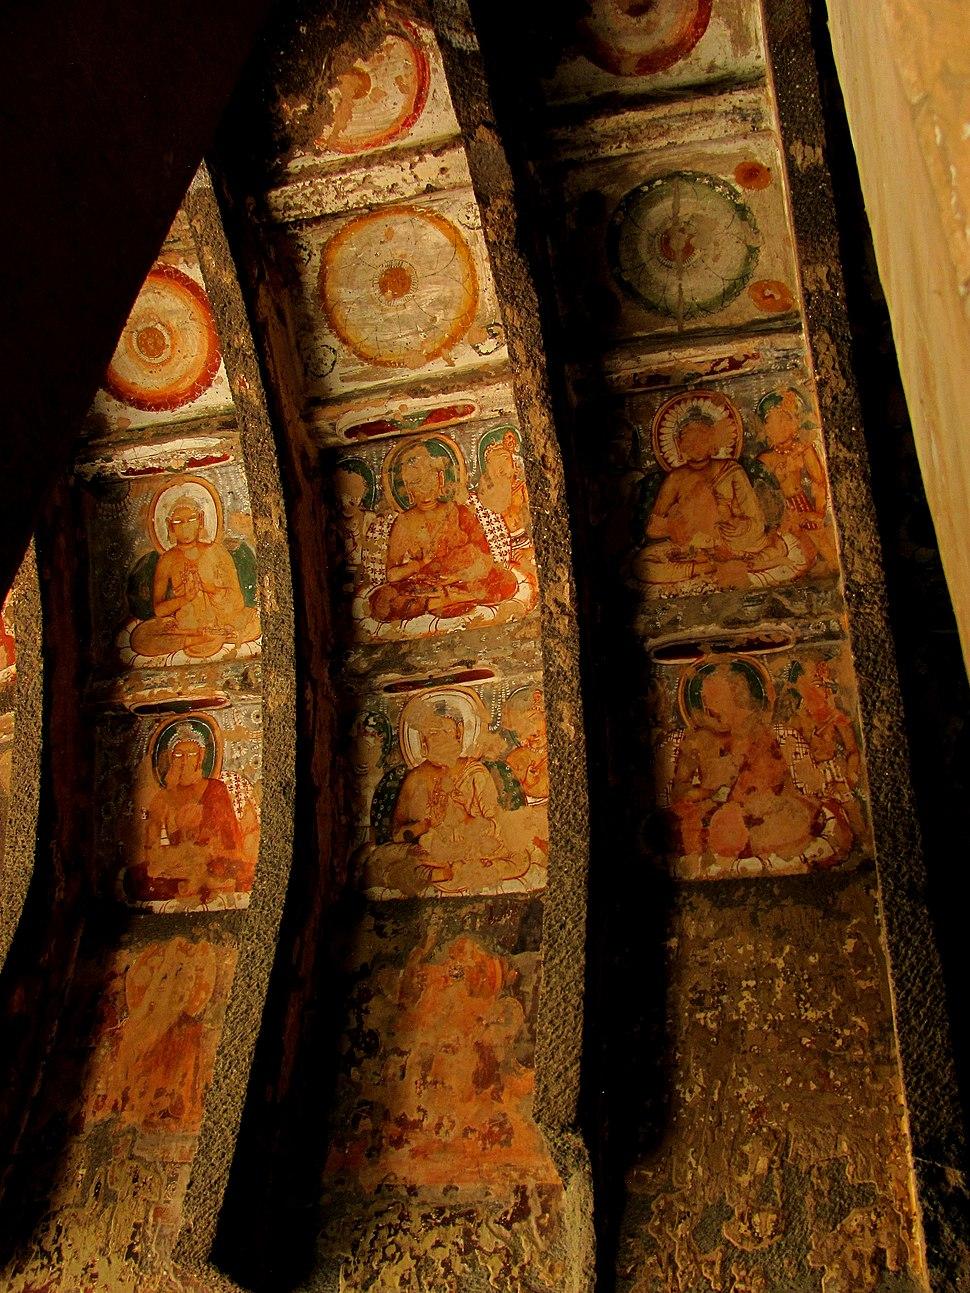 Life circle of Lord Buddha - A marvel of painting inside Ajanta Cave